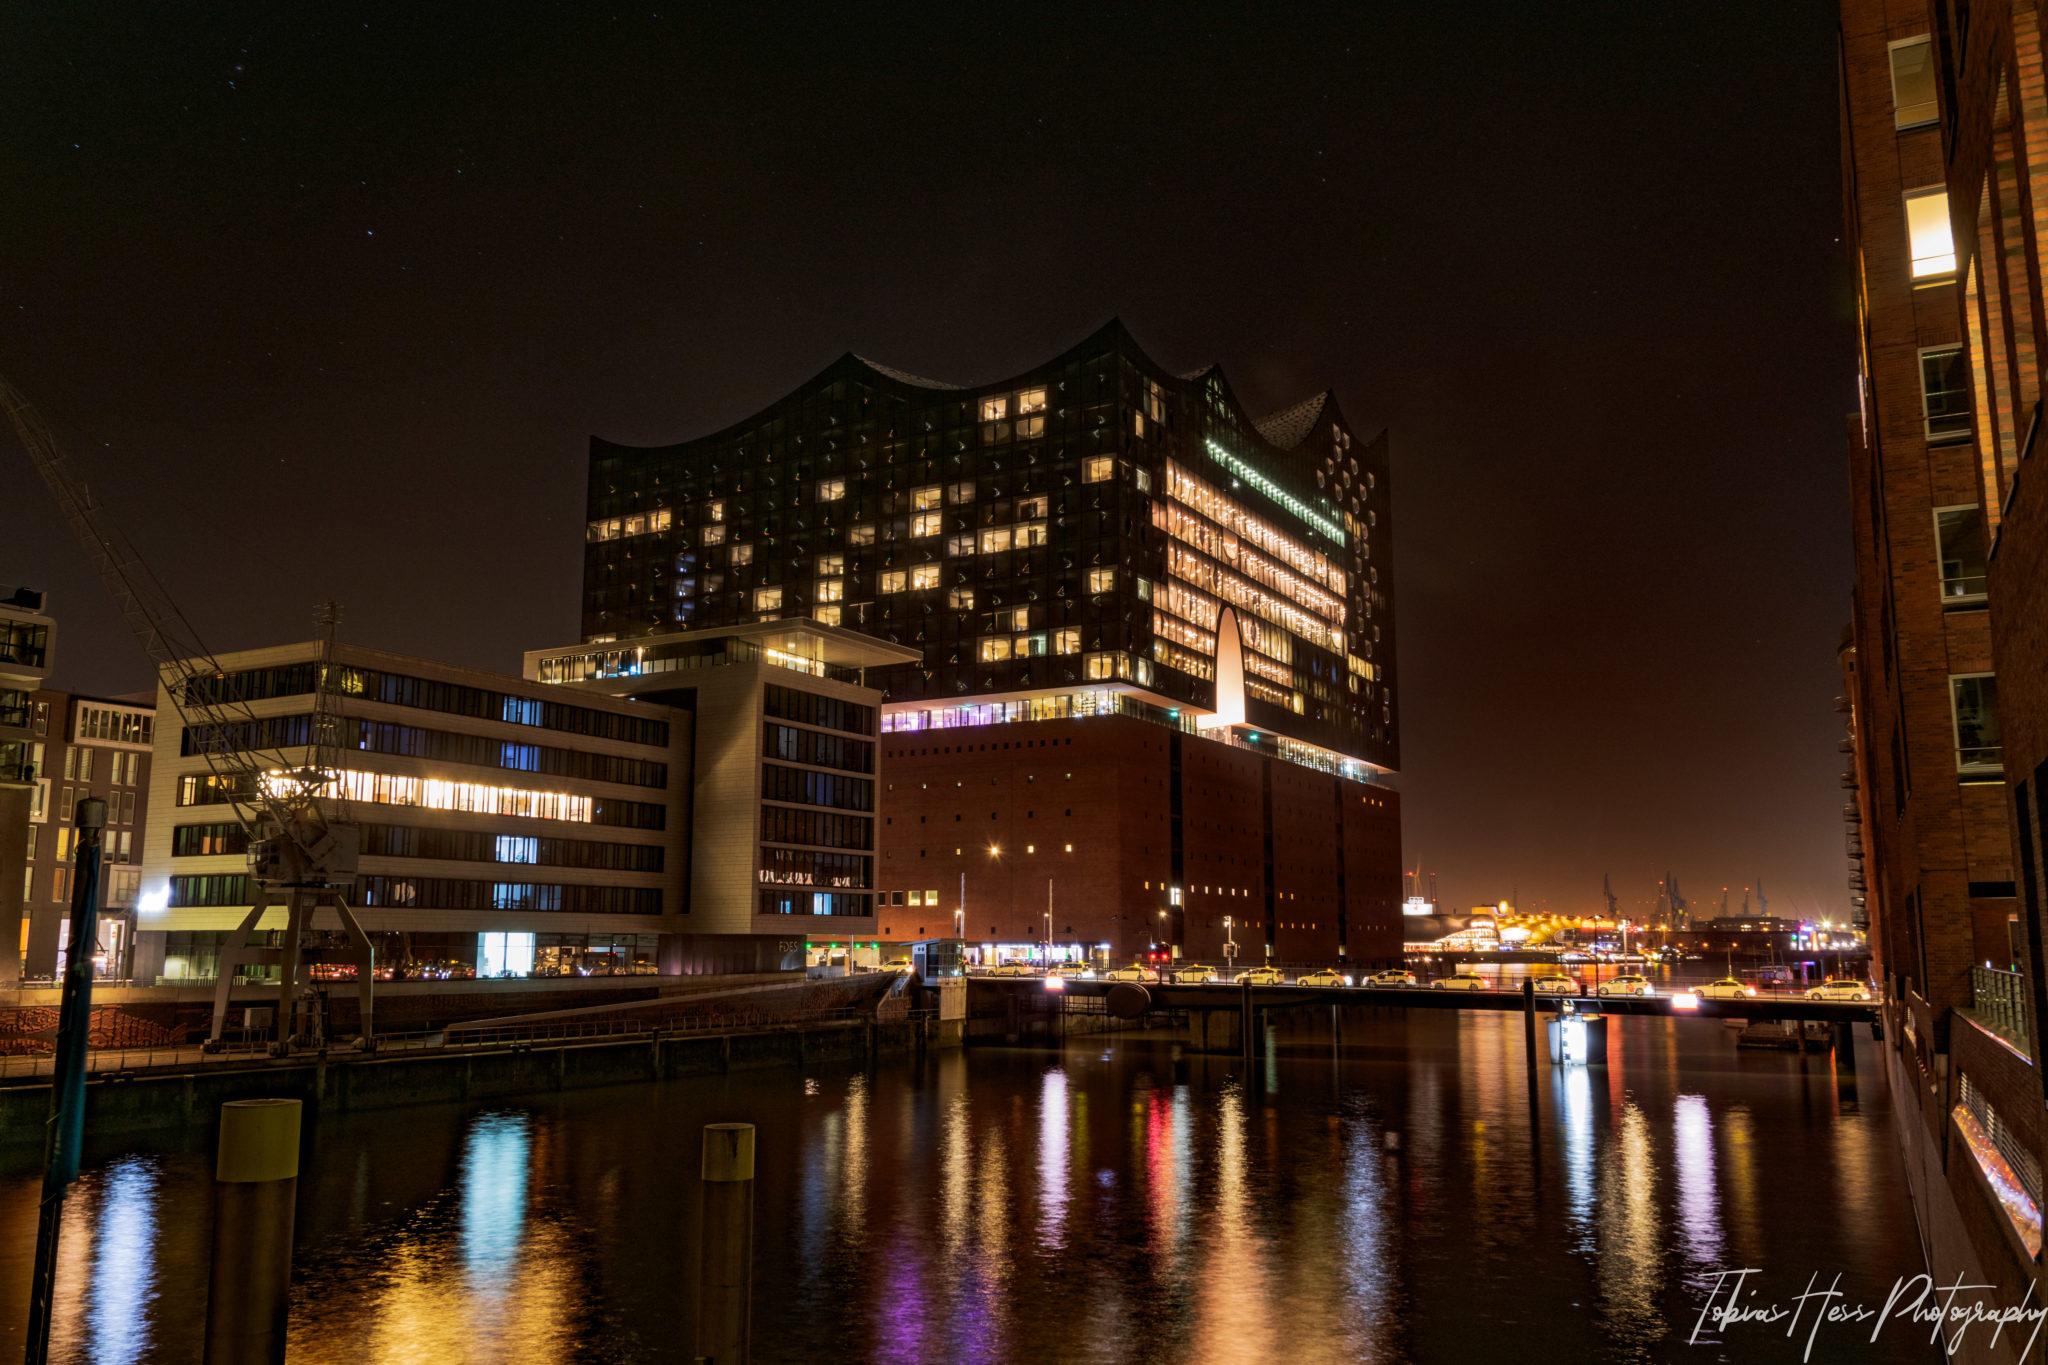 Elbphilharmonie Hamburg Nachtfotografie